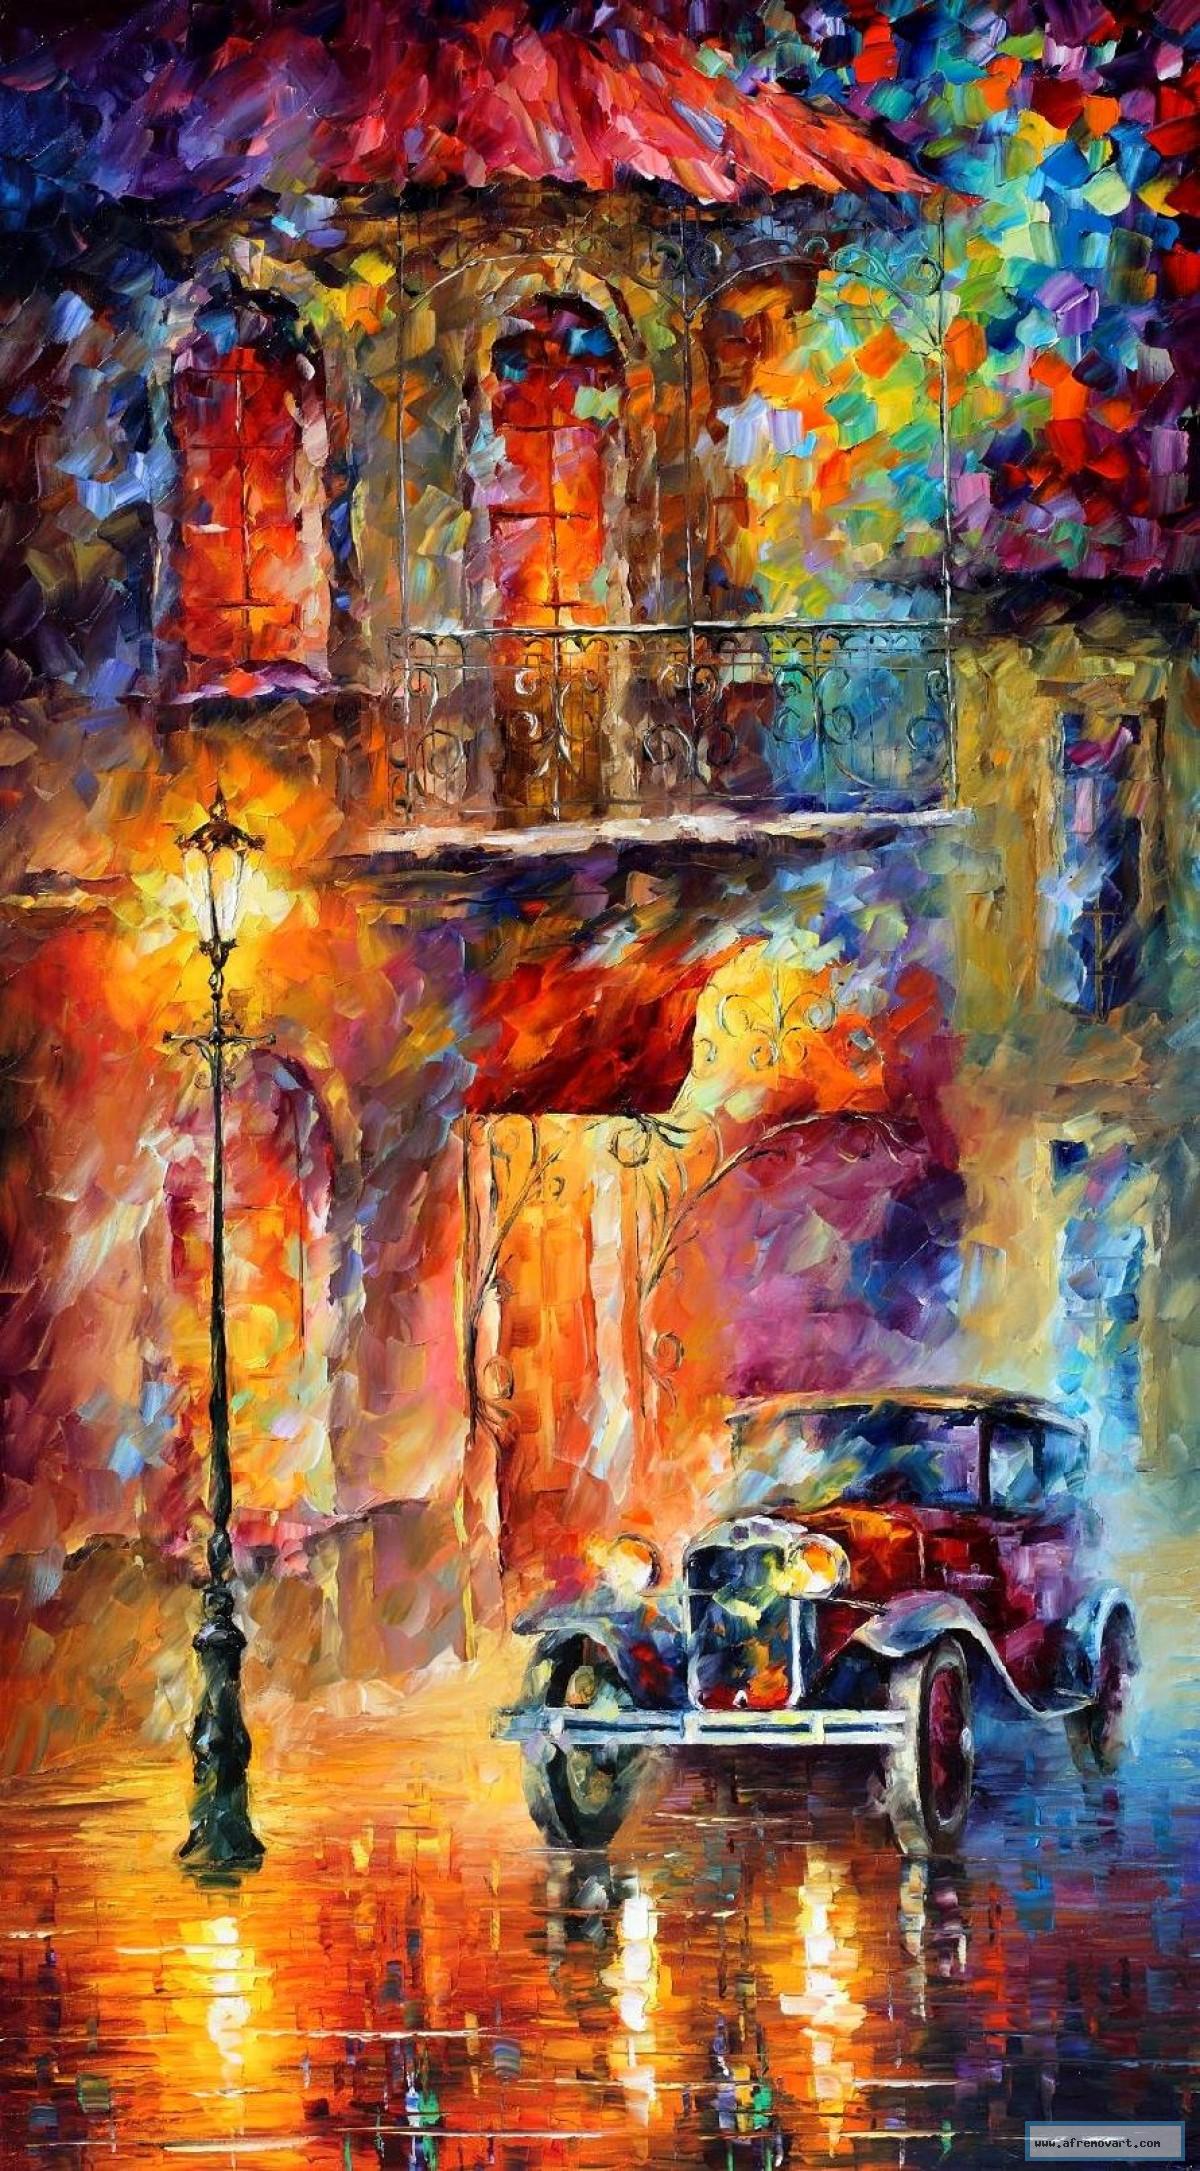 Vitebsk Light — PALETTE KNIFE Oil Painting On Canvas By Leonid Afremov studio